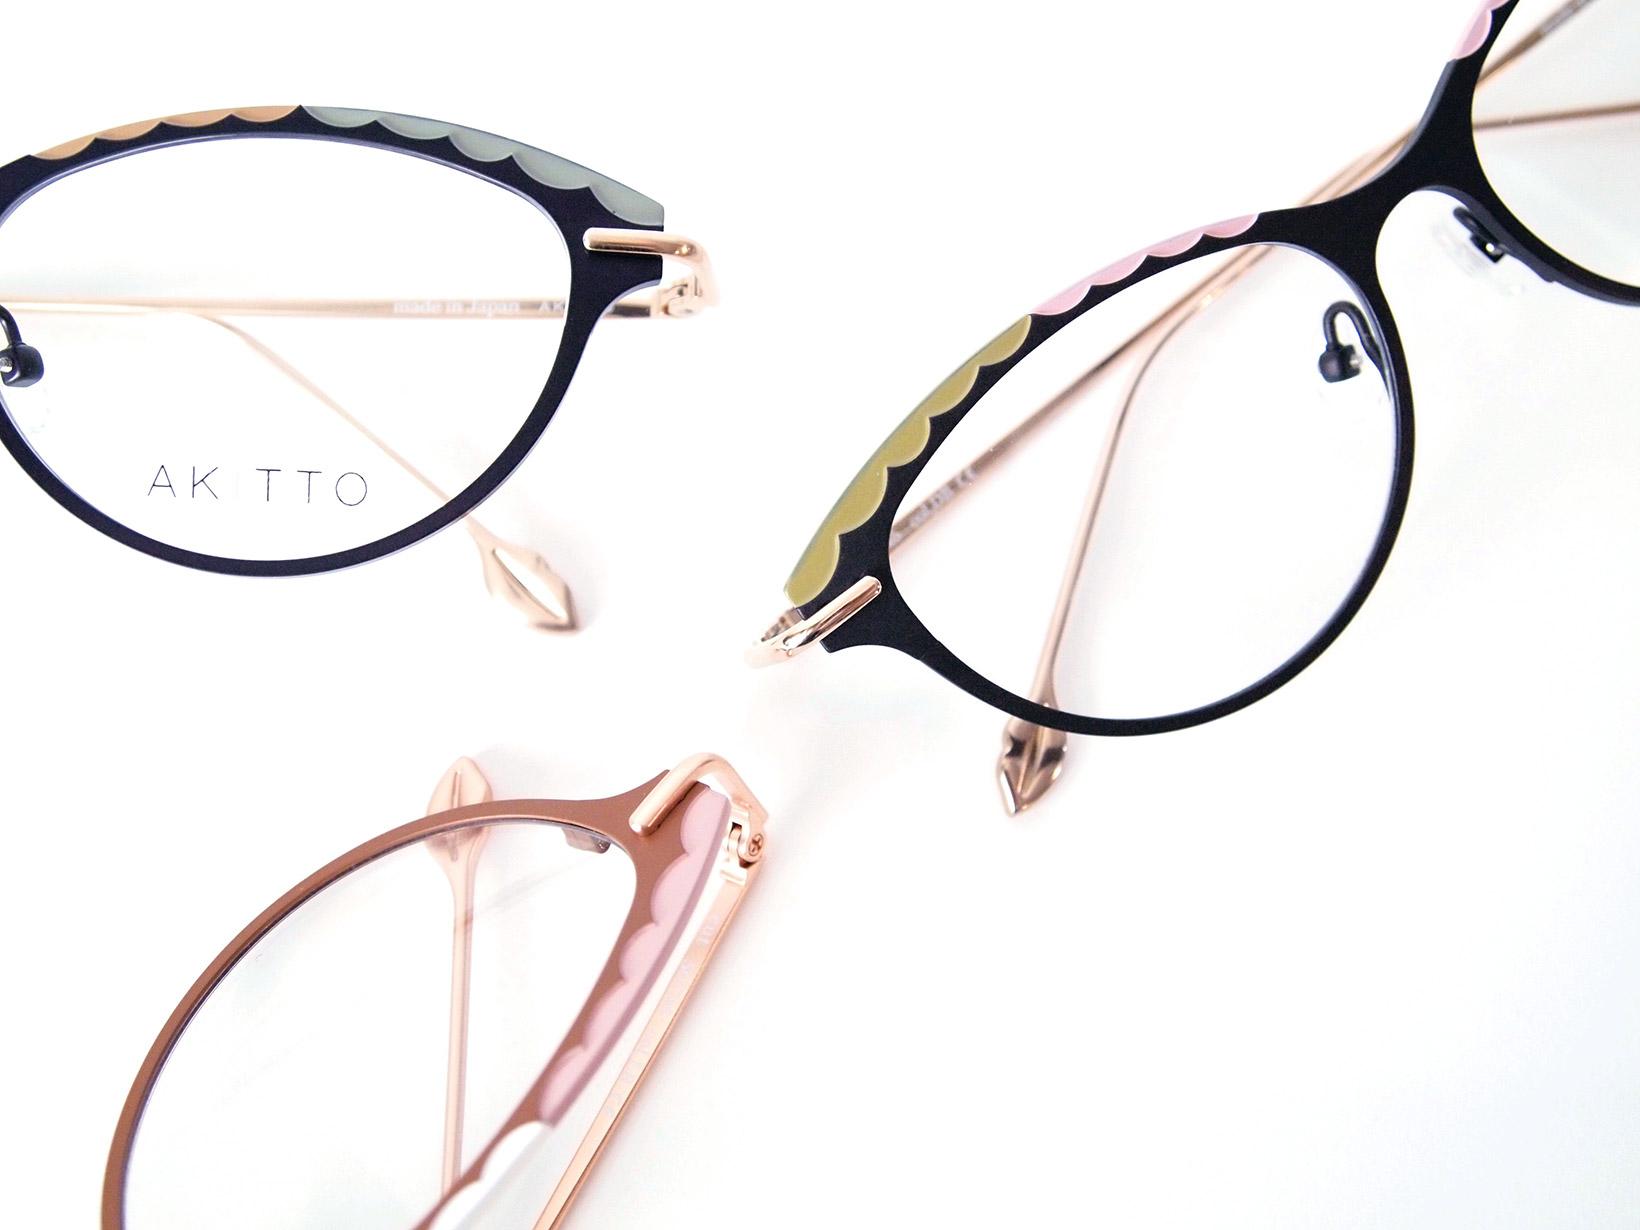 AKITTO 2017-4th cut size:50□16 material:titanium price:¥44,500-(+tax)